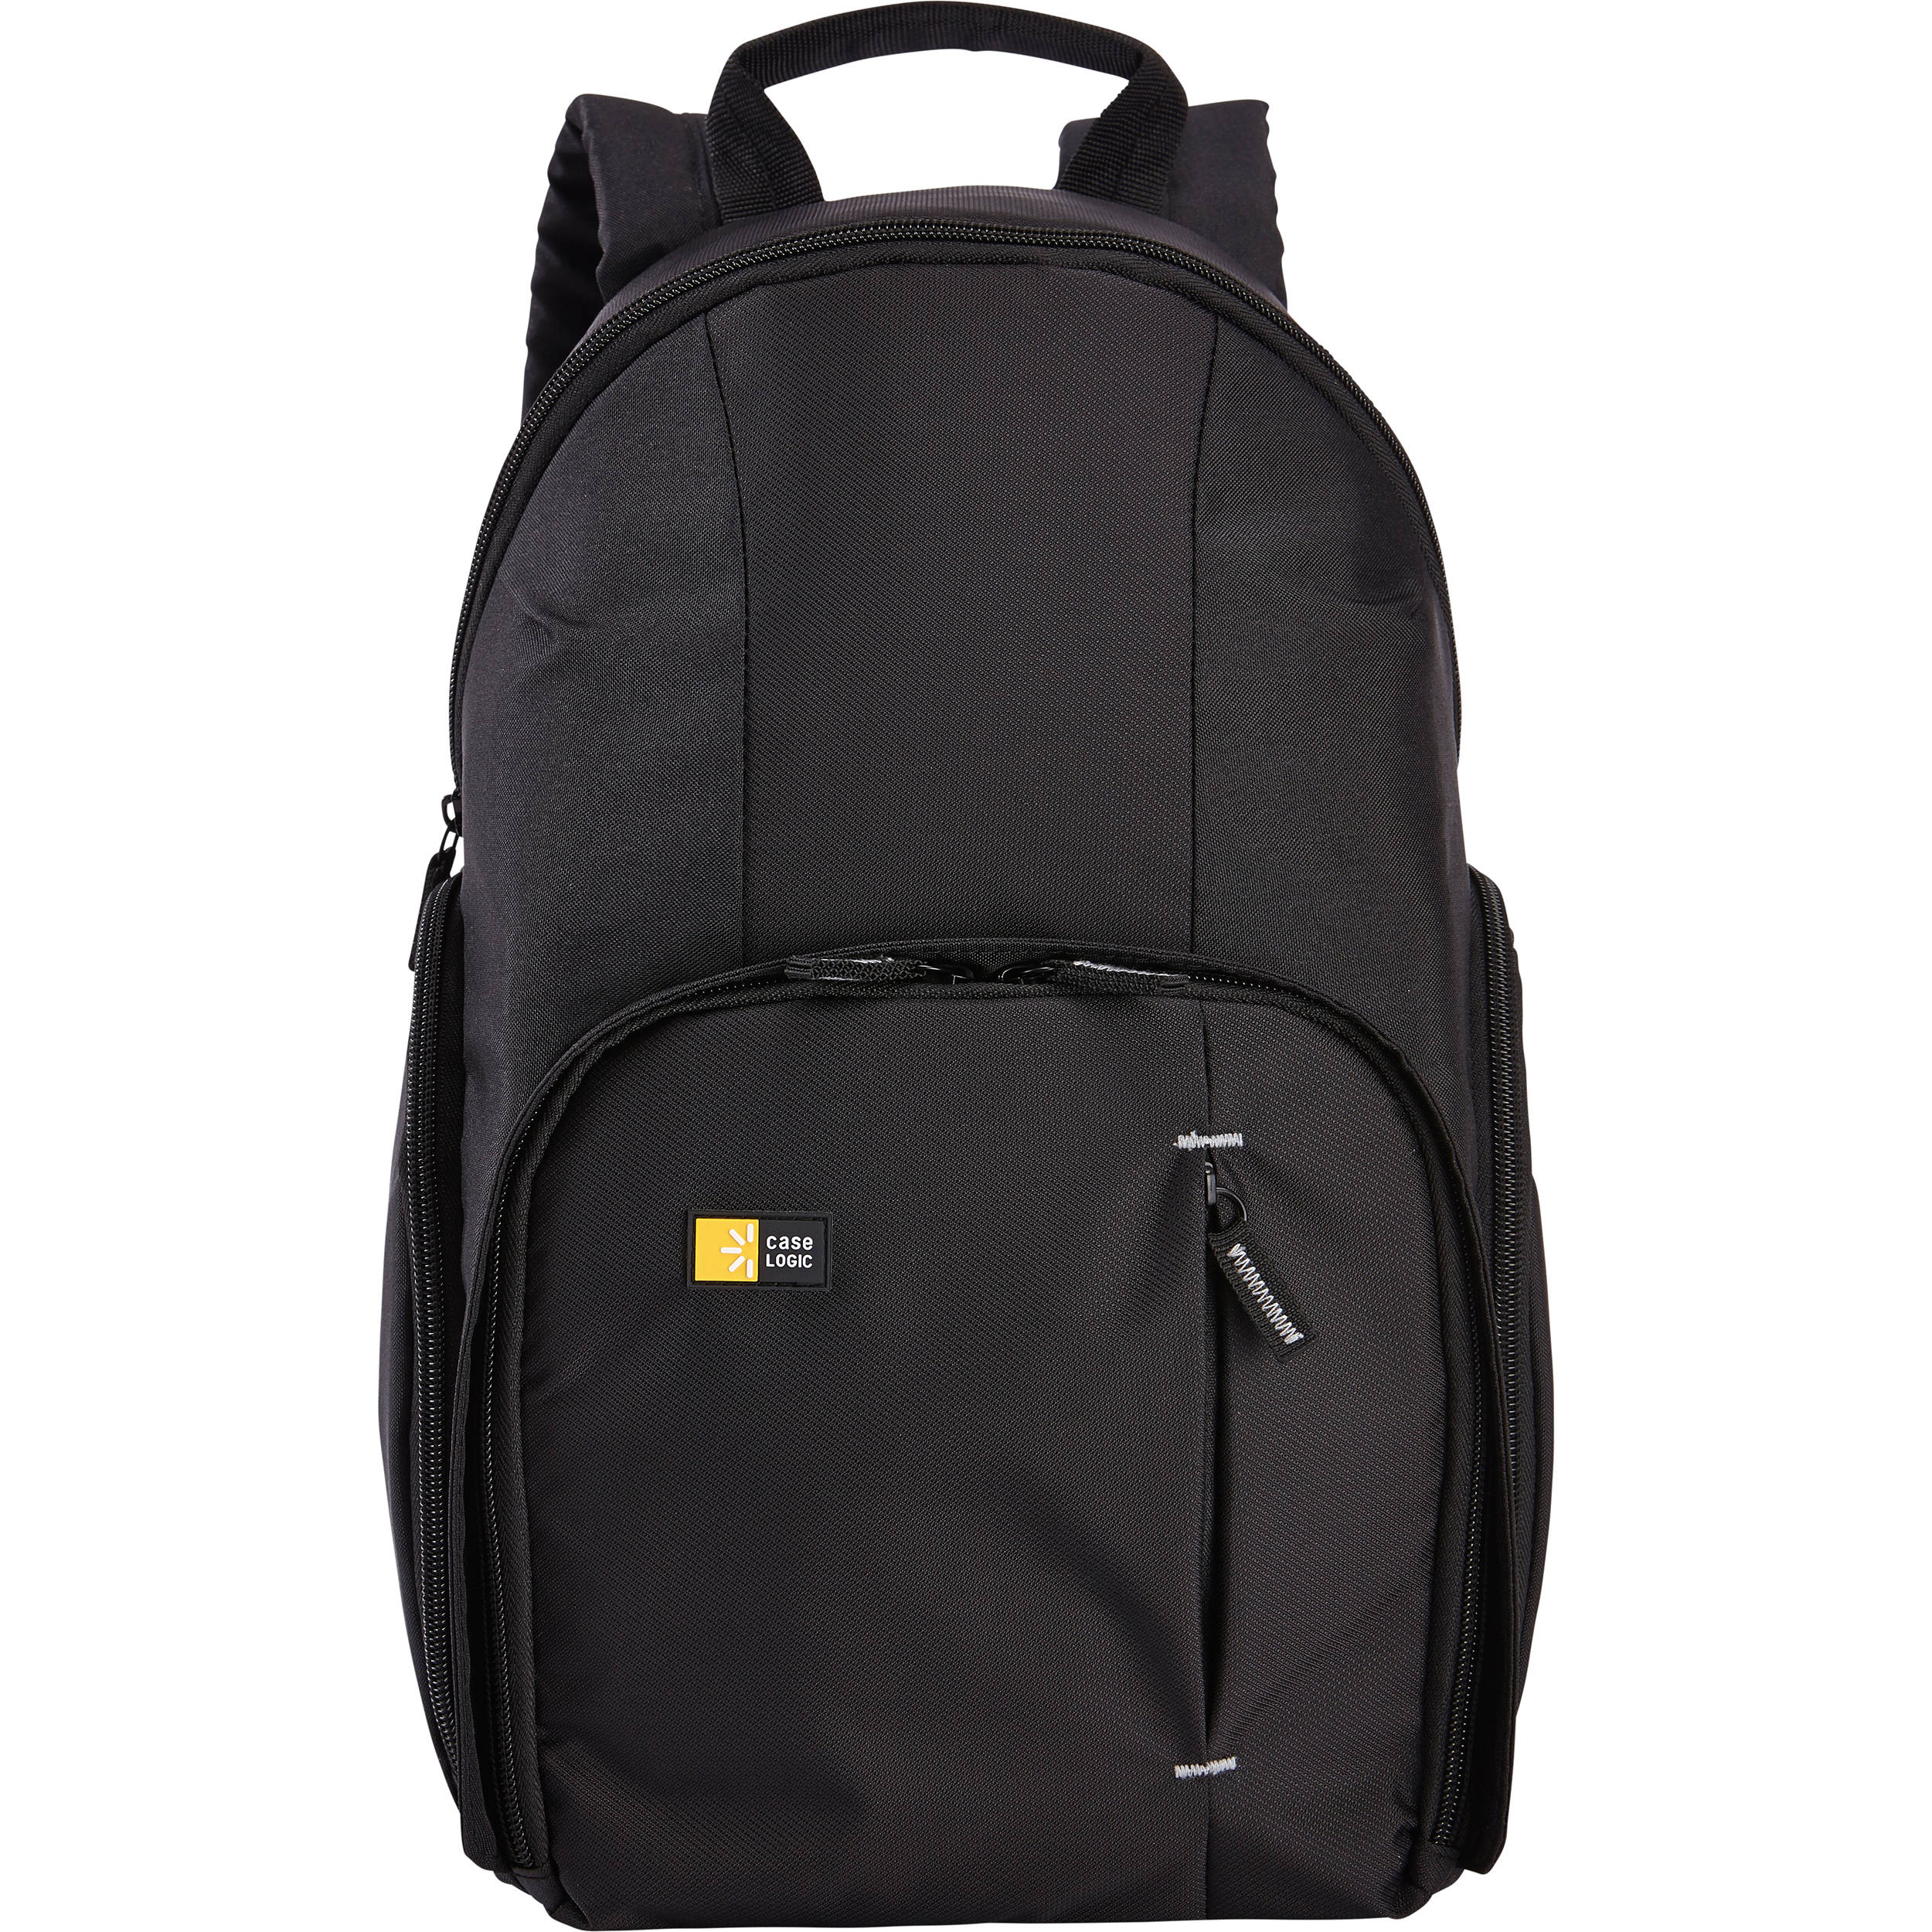 Case Logic Dslr Compact Backpack Black Tbc411black B Amp H Photo